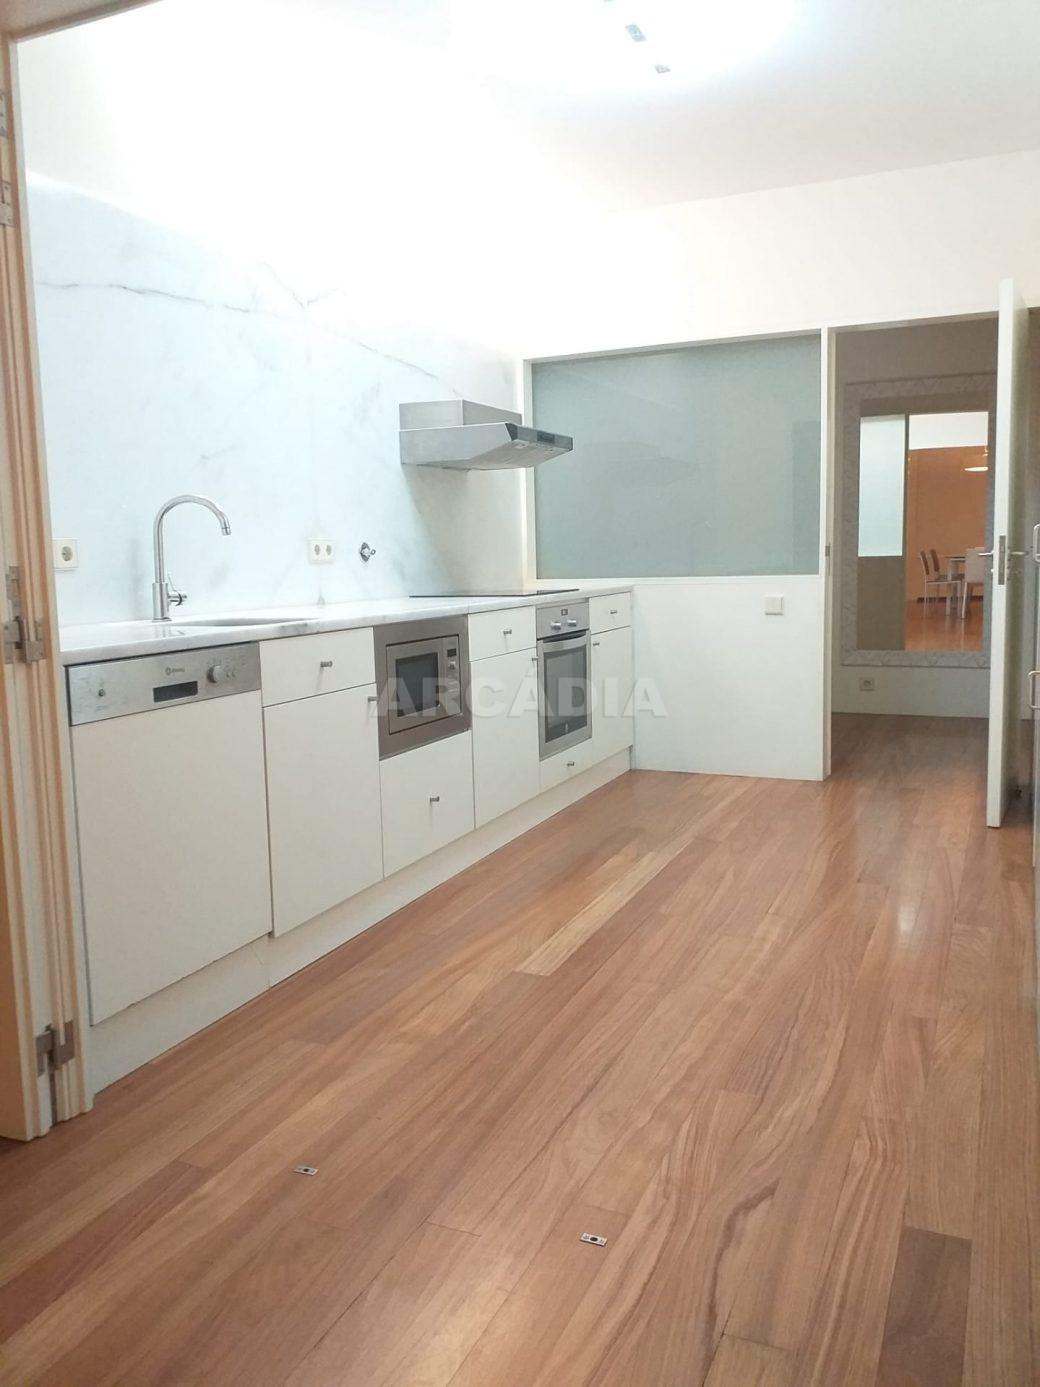 arcadia-imobiliaria-braga-apartamento-no-centro-historico-de-braga-tipo-2-para-compra-11